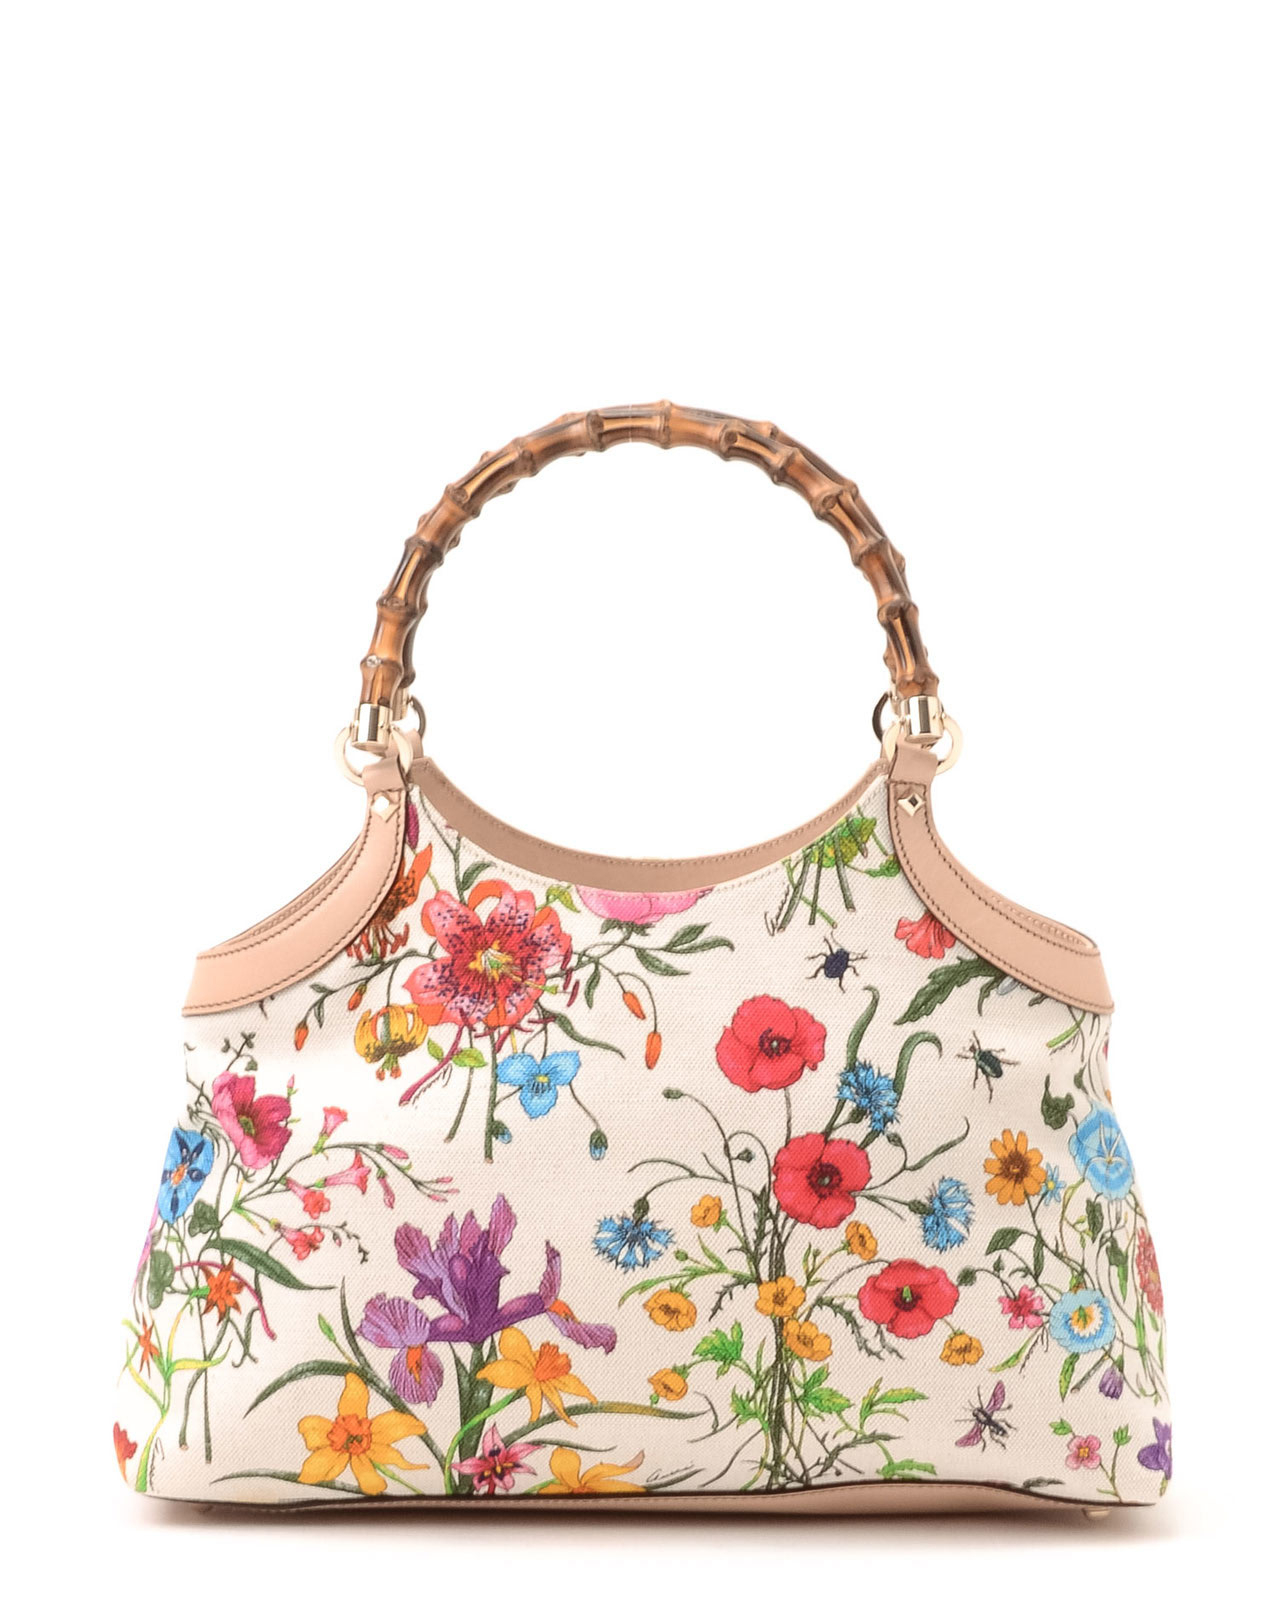 23d3ceeac Gucci Flora Bamboo Handbag in White - Lyst